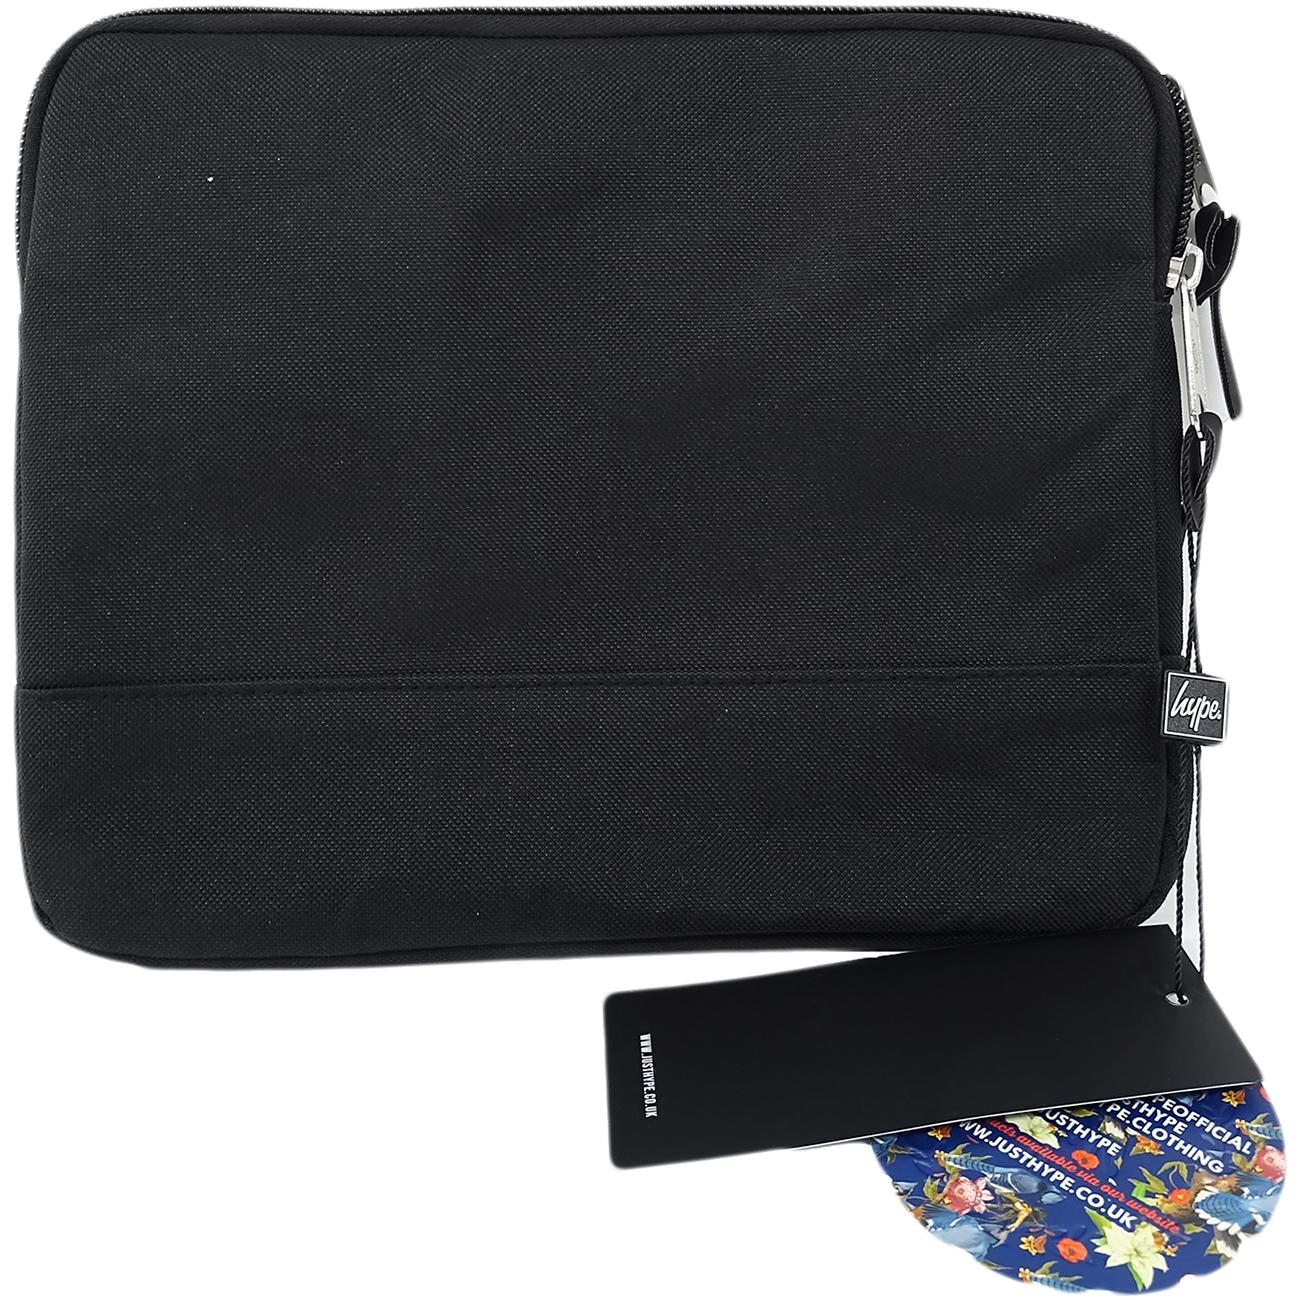 Unisexe-Hype-Sac-A-Dos-Ecole-Gym-SACS-pochettes-pencil-case miniature 217